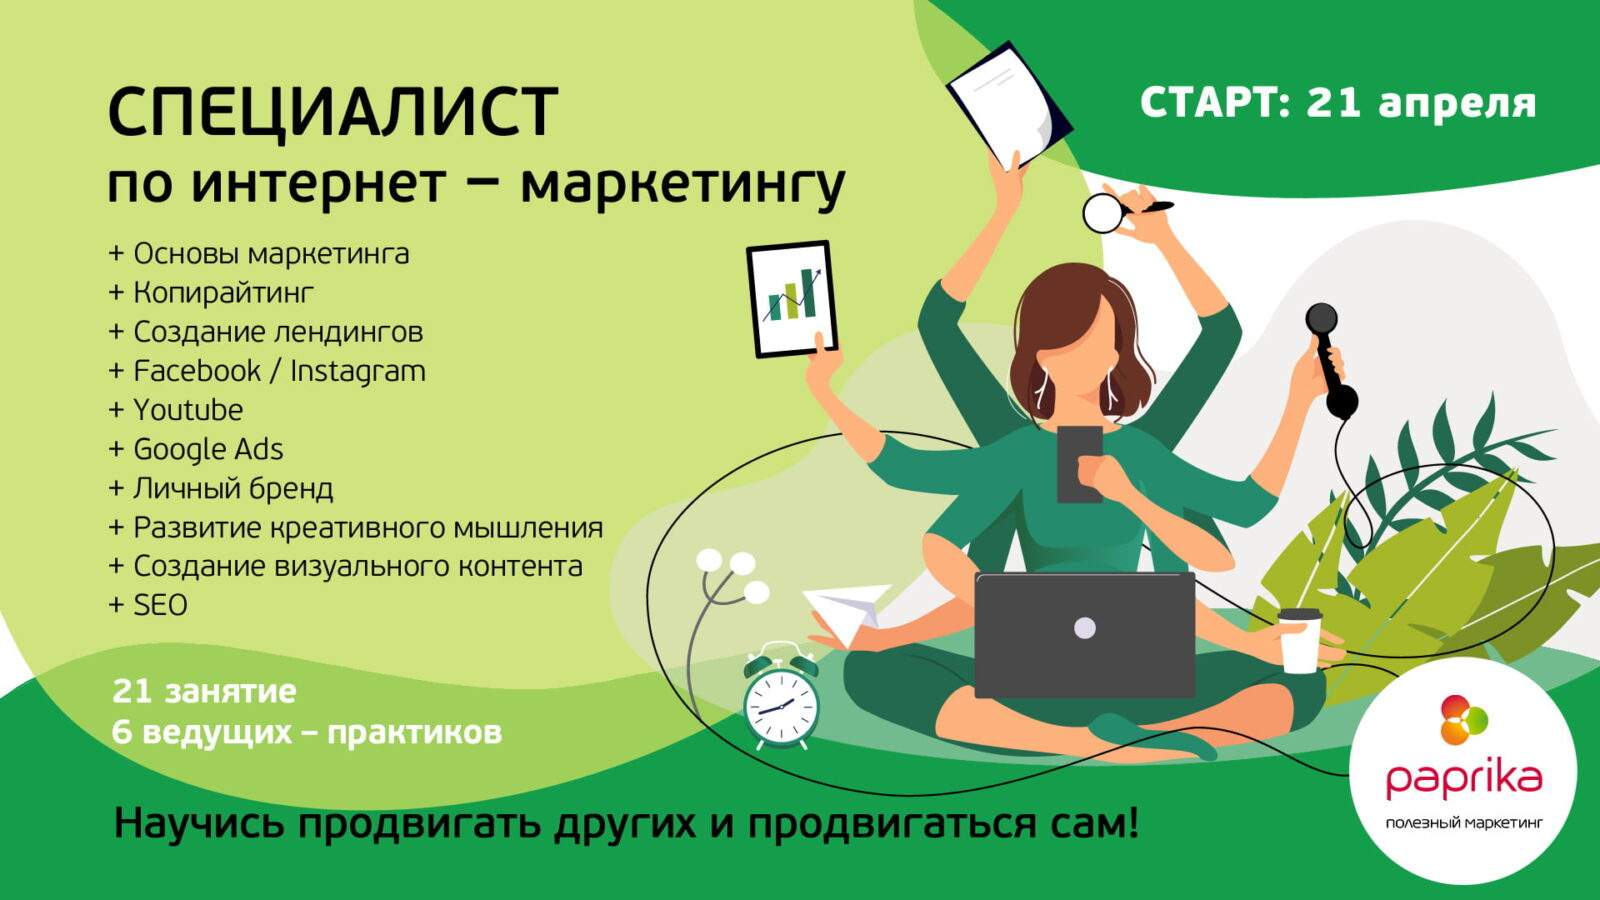 Тренинг «Специалист по интернет-маркетингу» (главная)